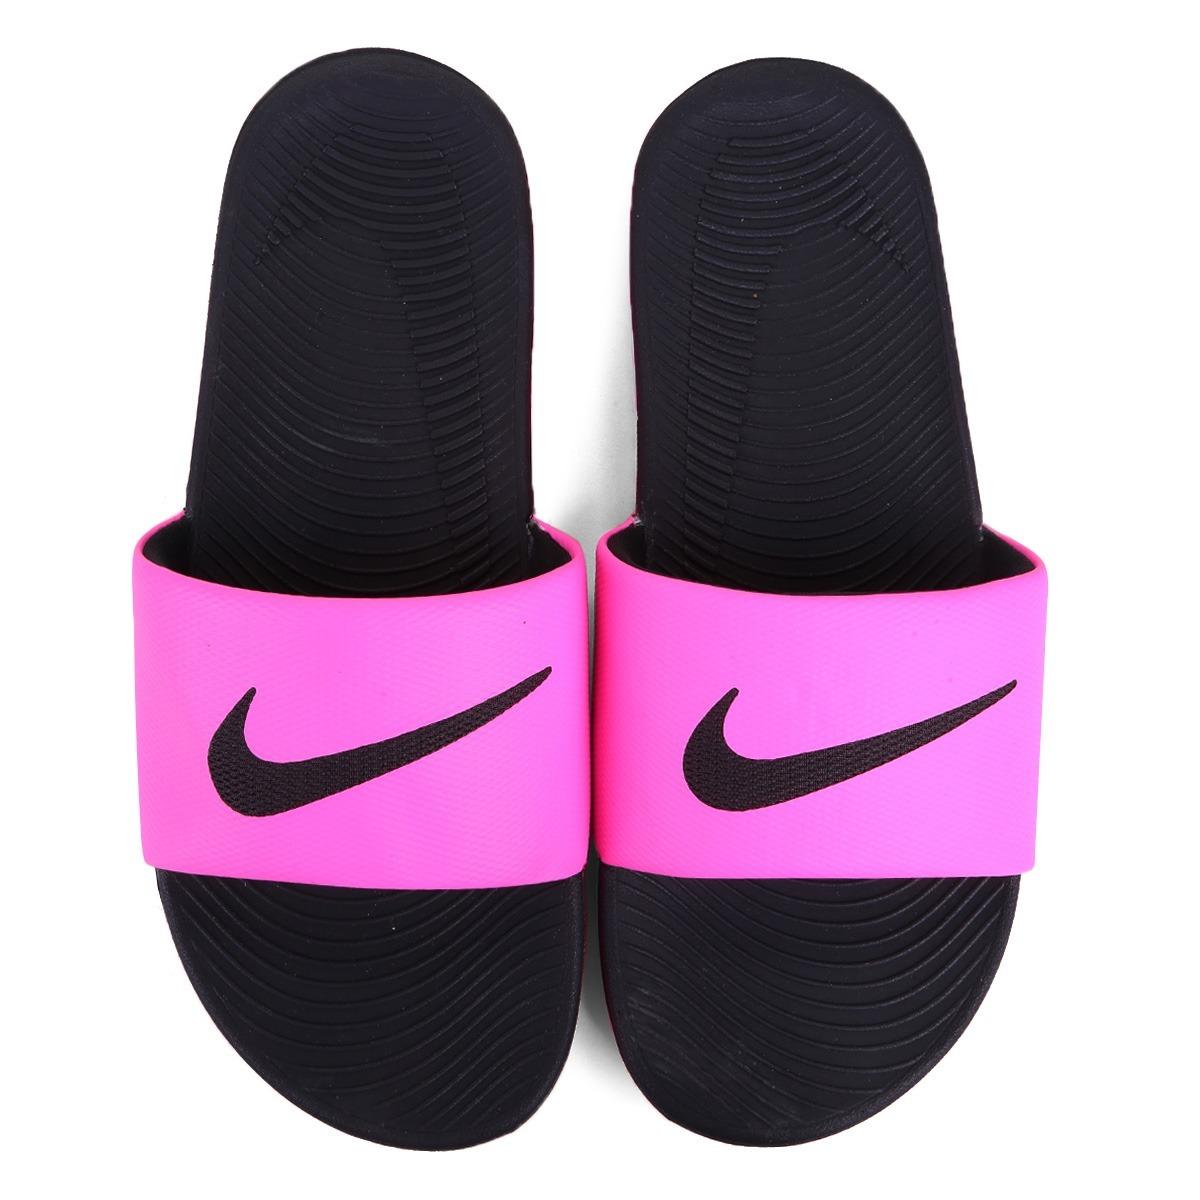 0d446e6a2 Chinelo Nike Kawa Slide Feminina Juvenil (novo E Original) - R  50 ...